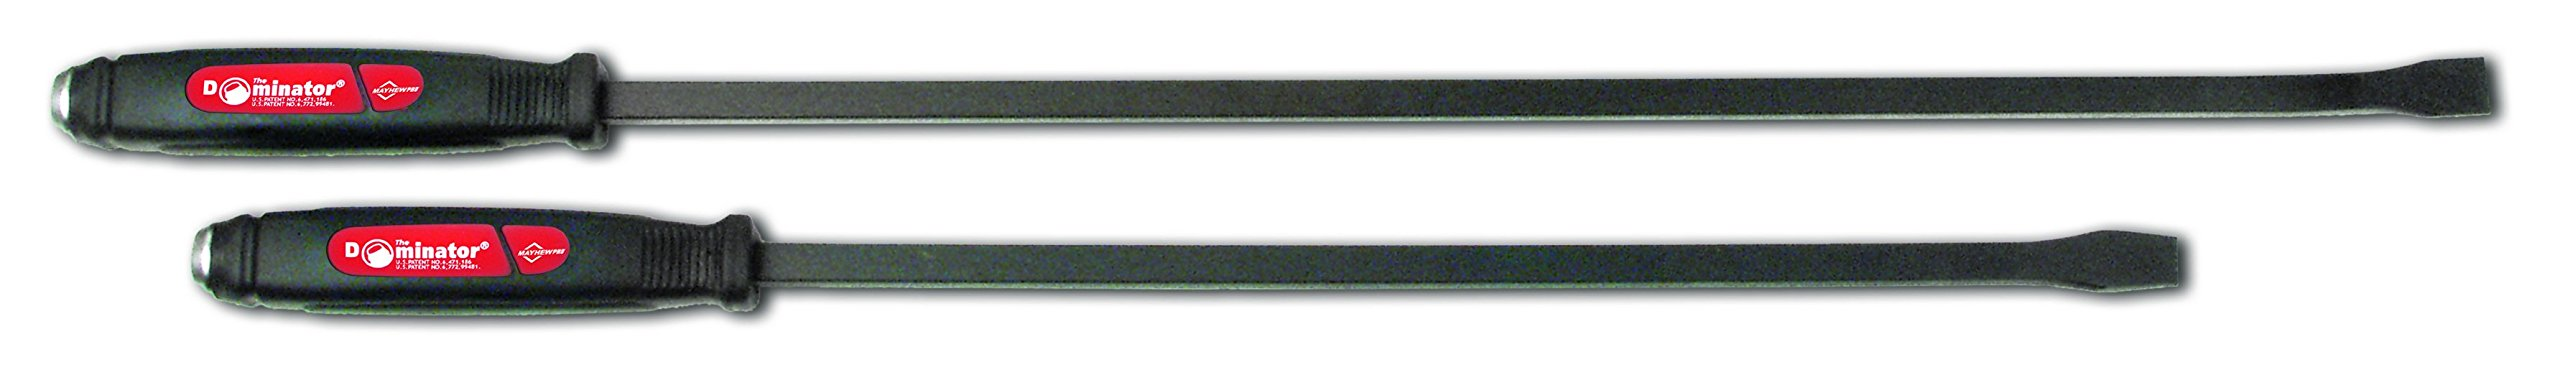 Mayhew 61353 Dominator Screwdriver Pry Bar Set, Curved, 2-Piece